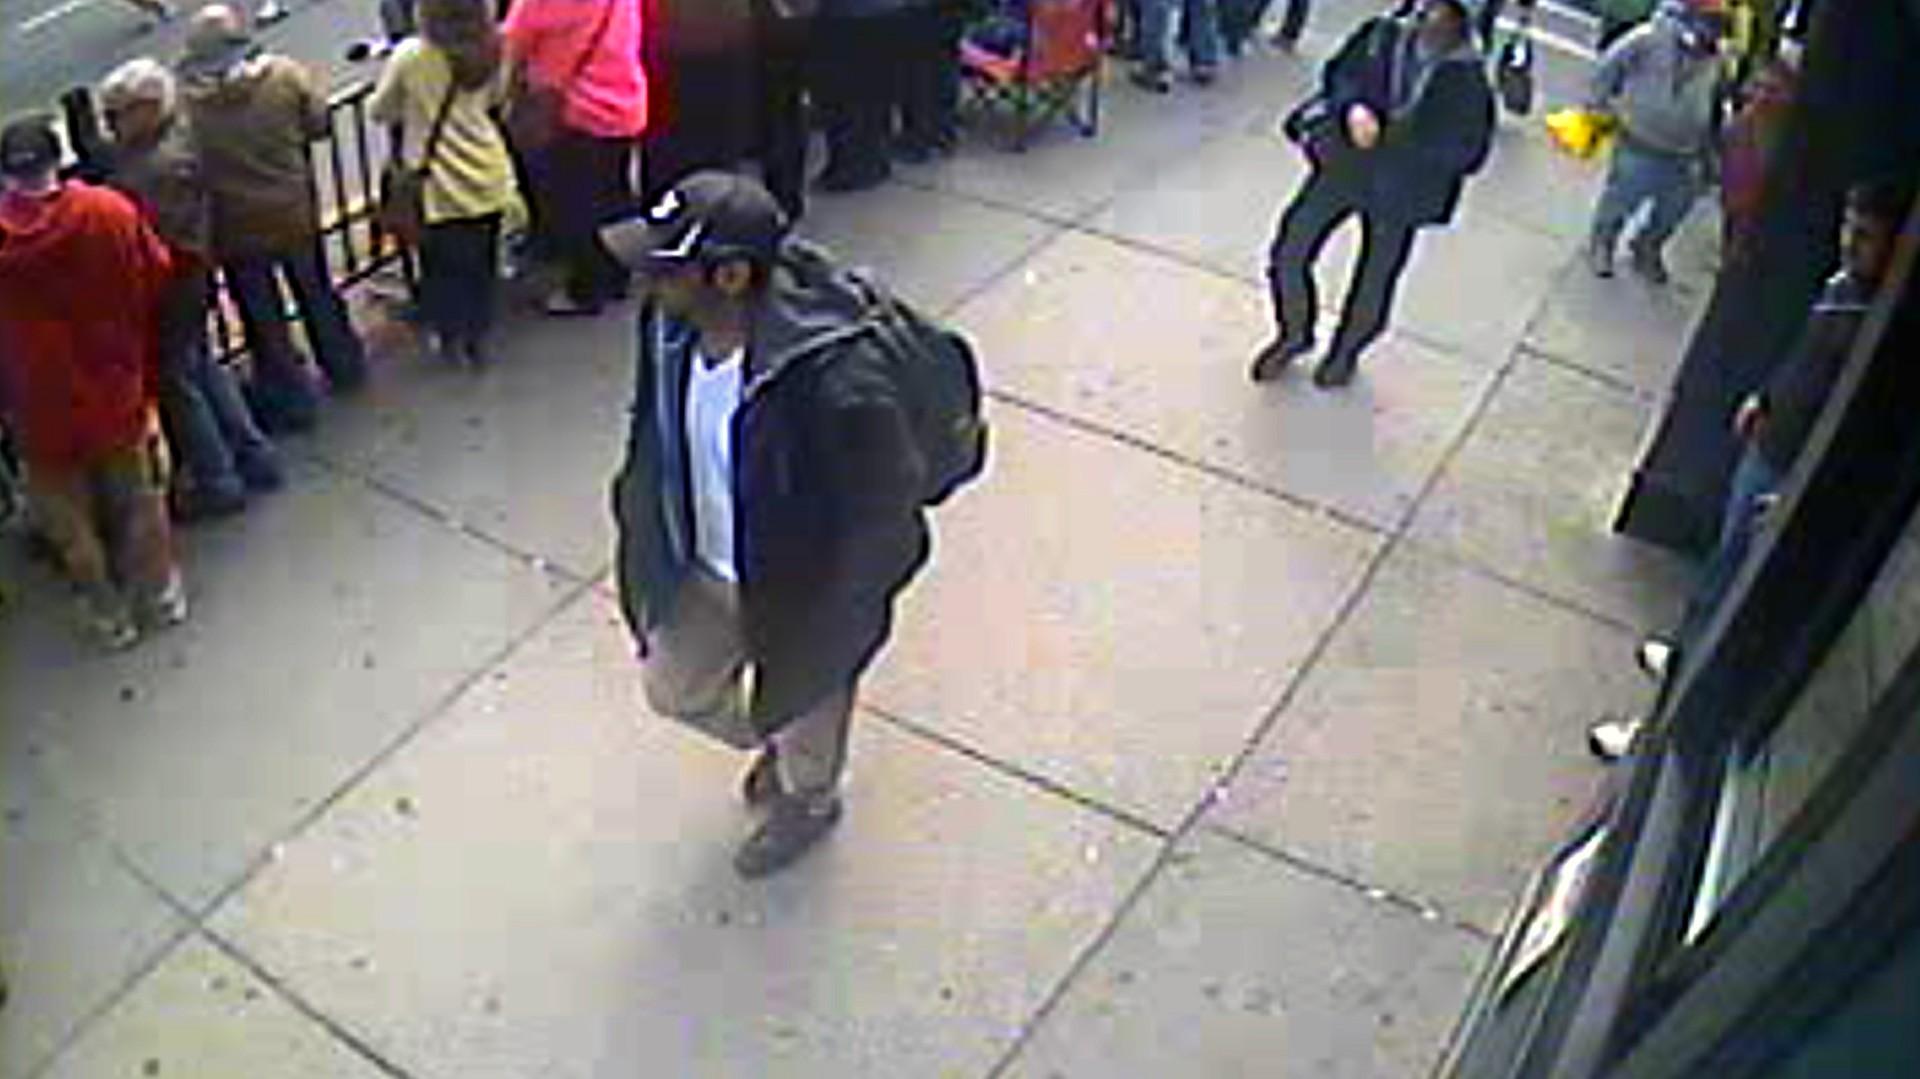 Attentats de Boston : Djokhar Tsarnaev condamné à mort malgré les incertitudes de l'enquête